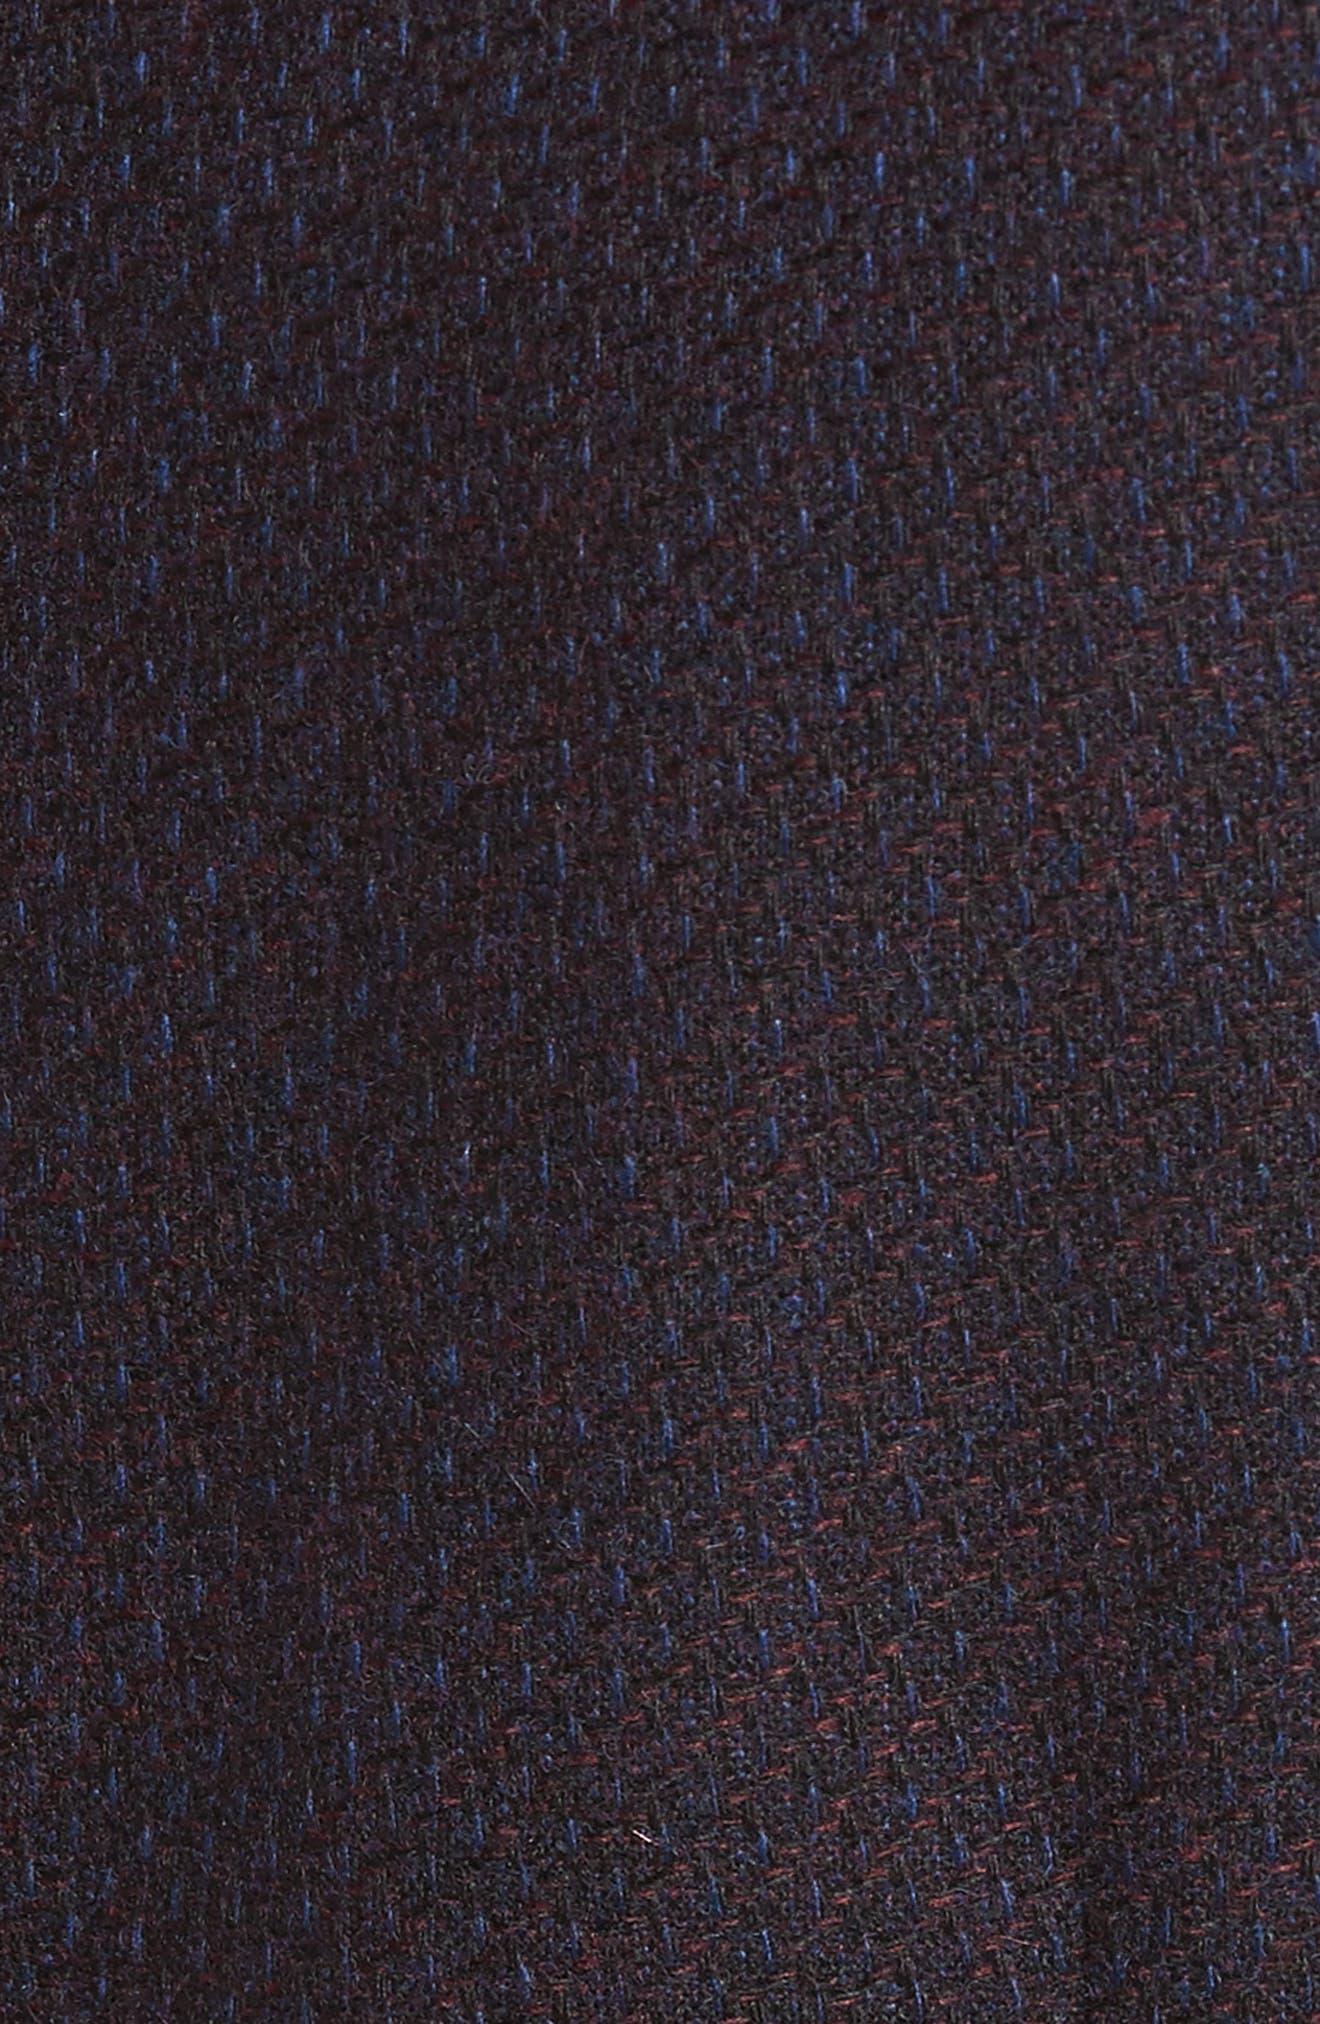 Textured Wool Blend Vest,                             Alternate thumbnail 5, color,                             Burgundy